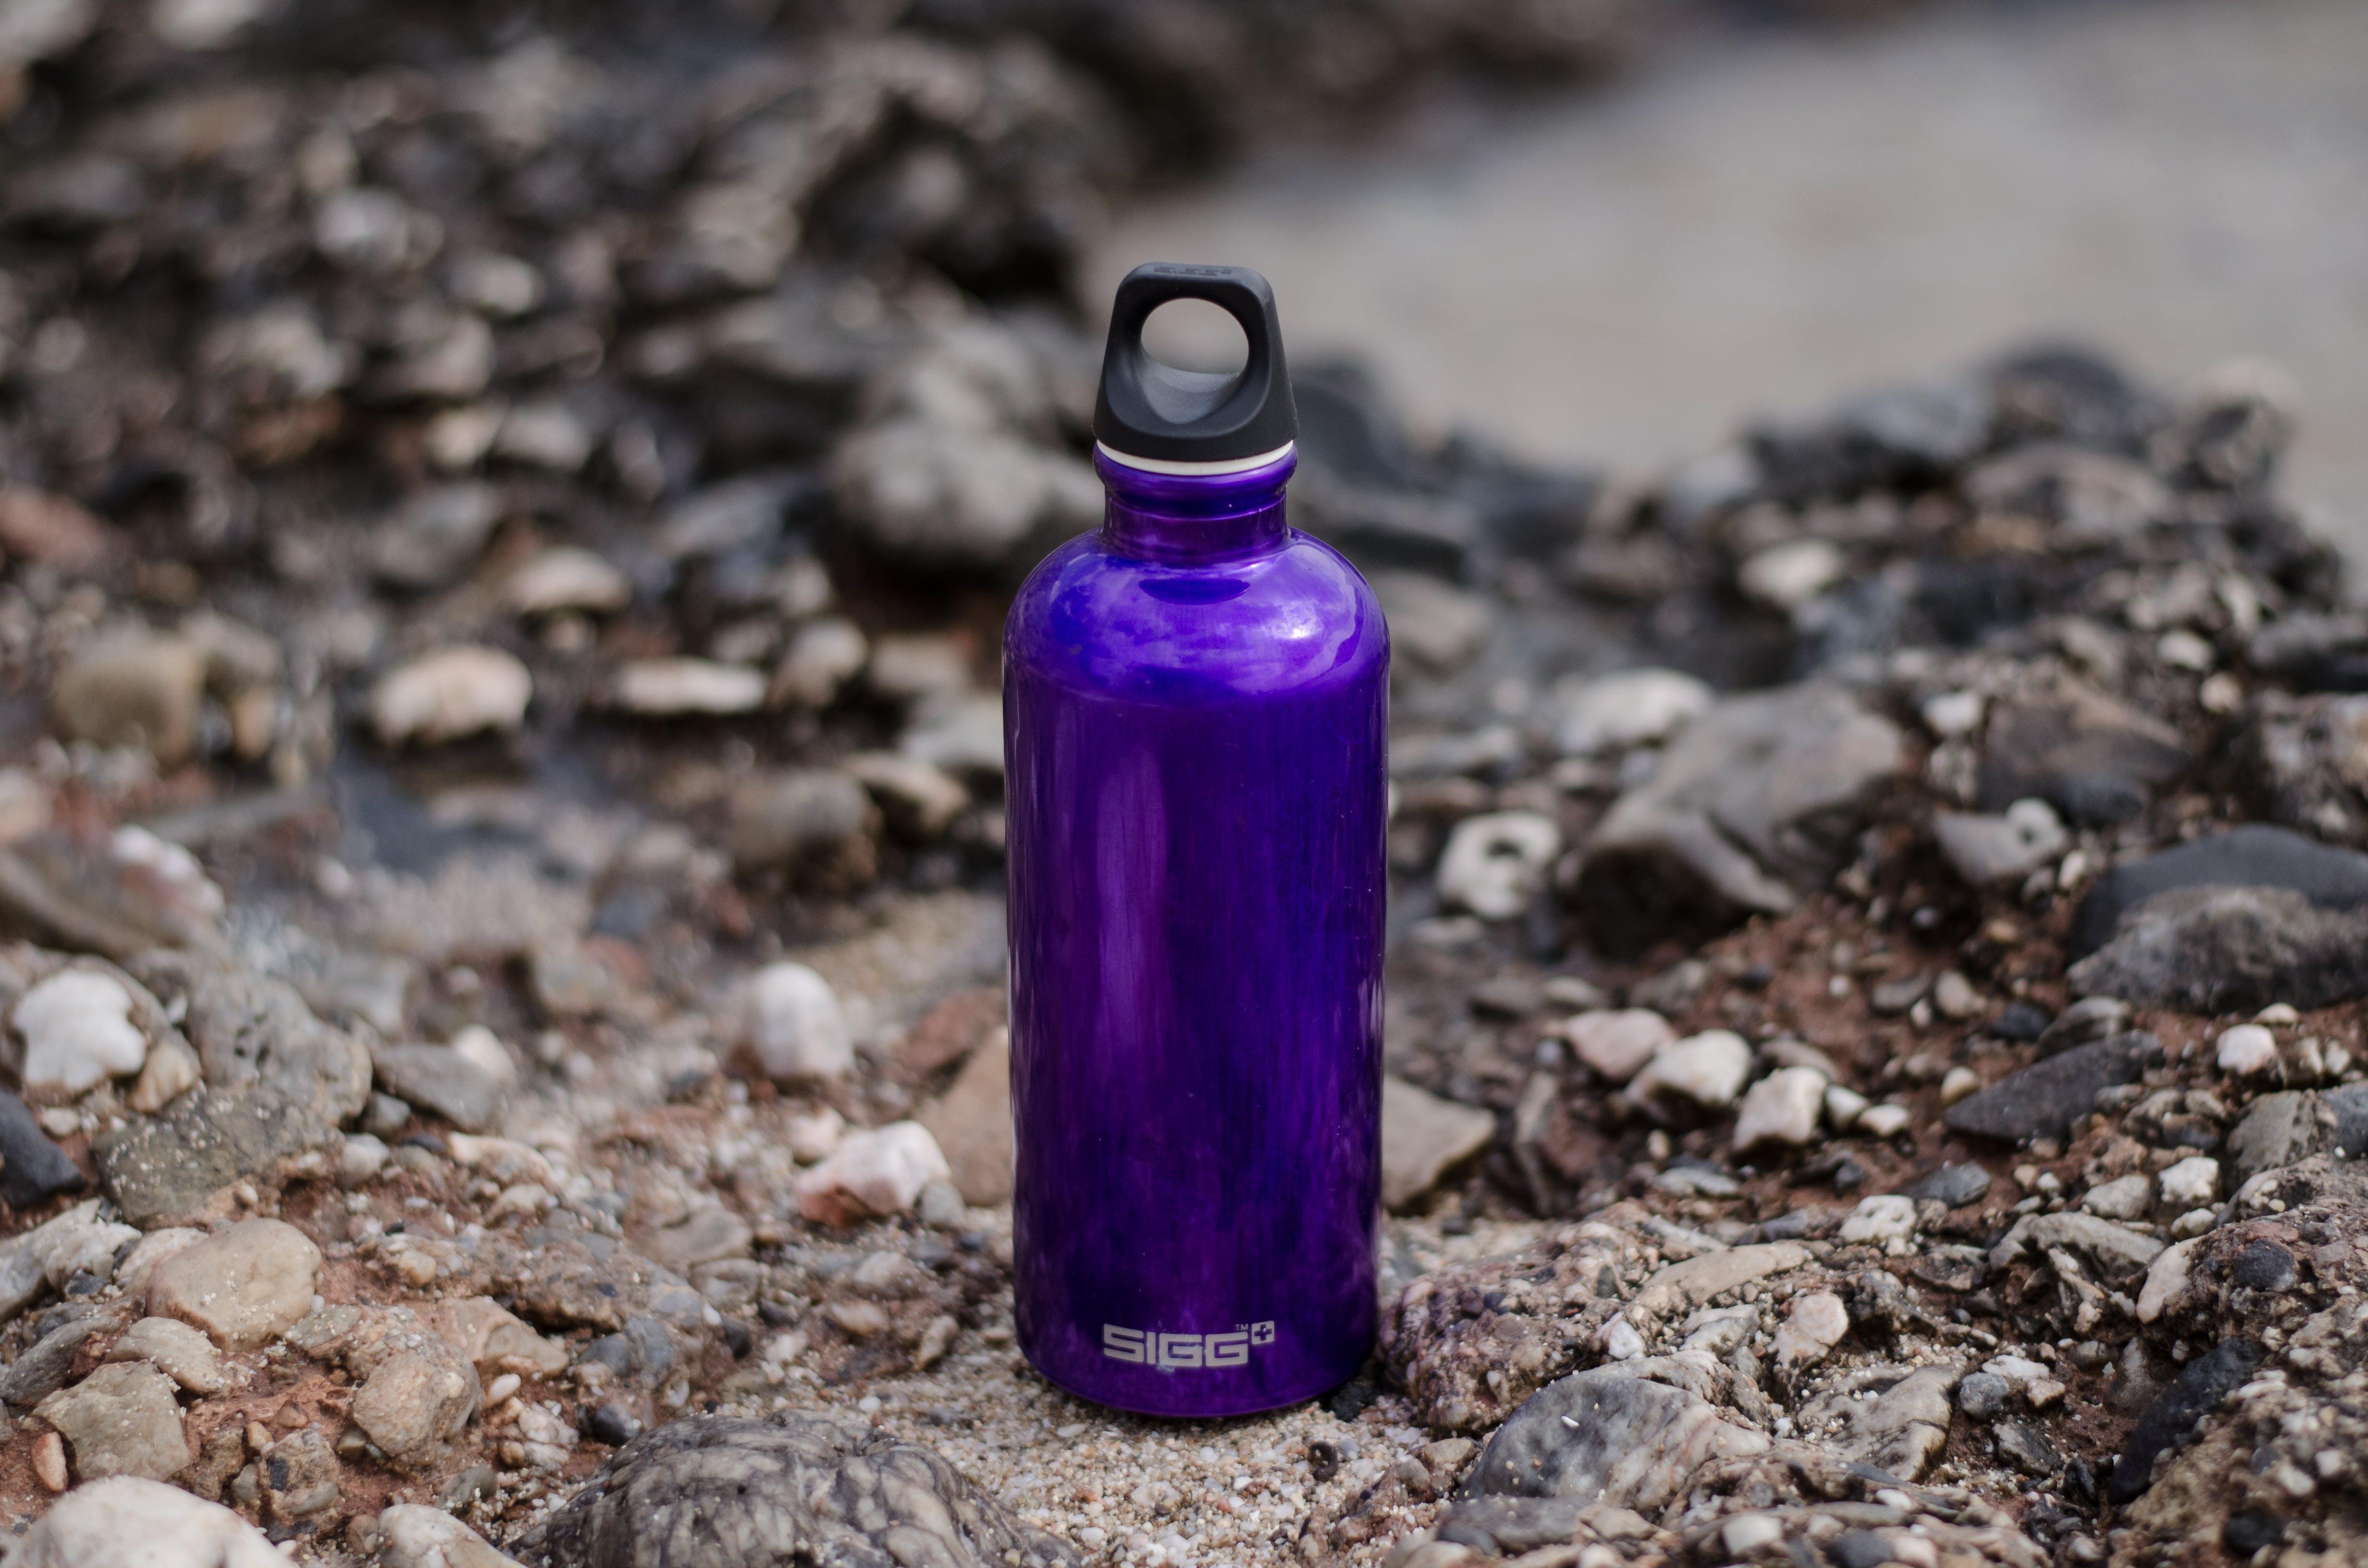 Purple Sports Bottle on Ground